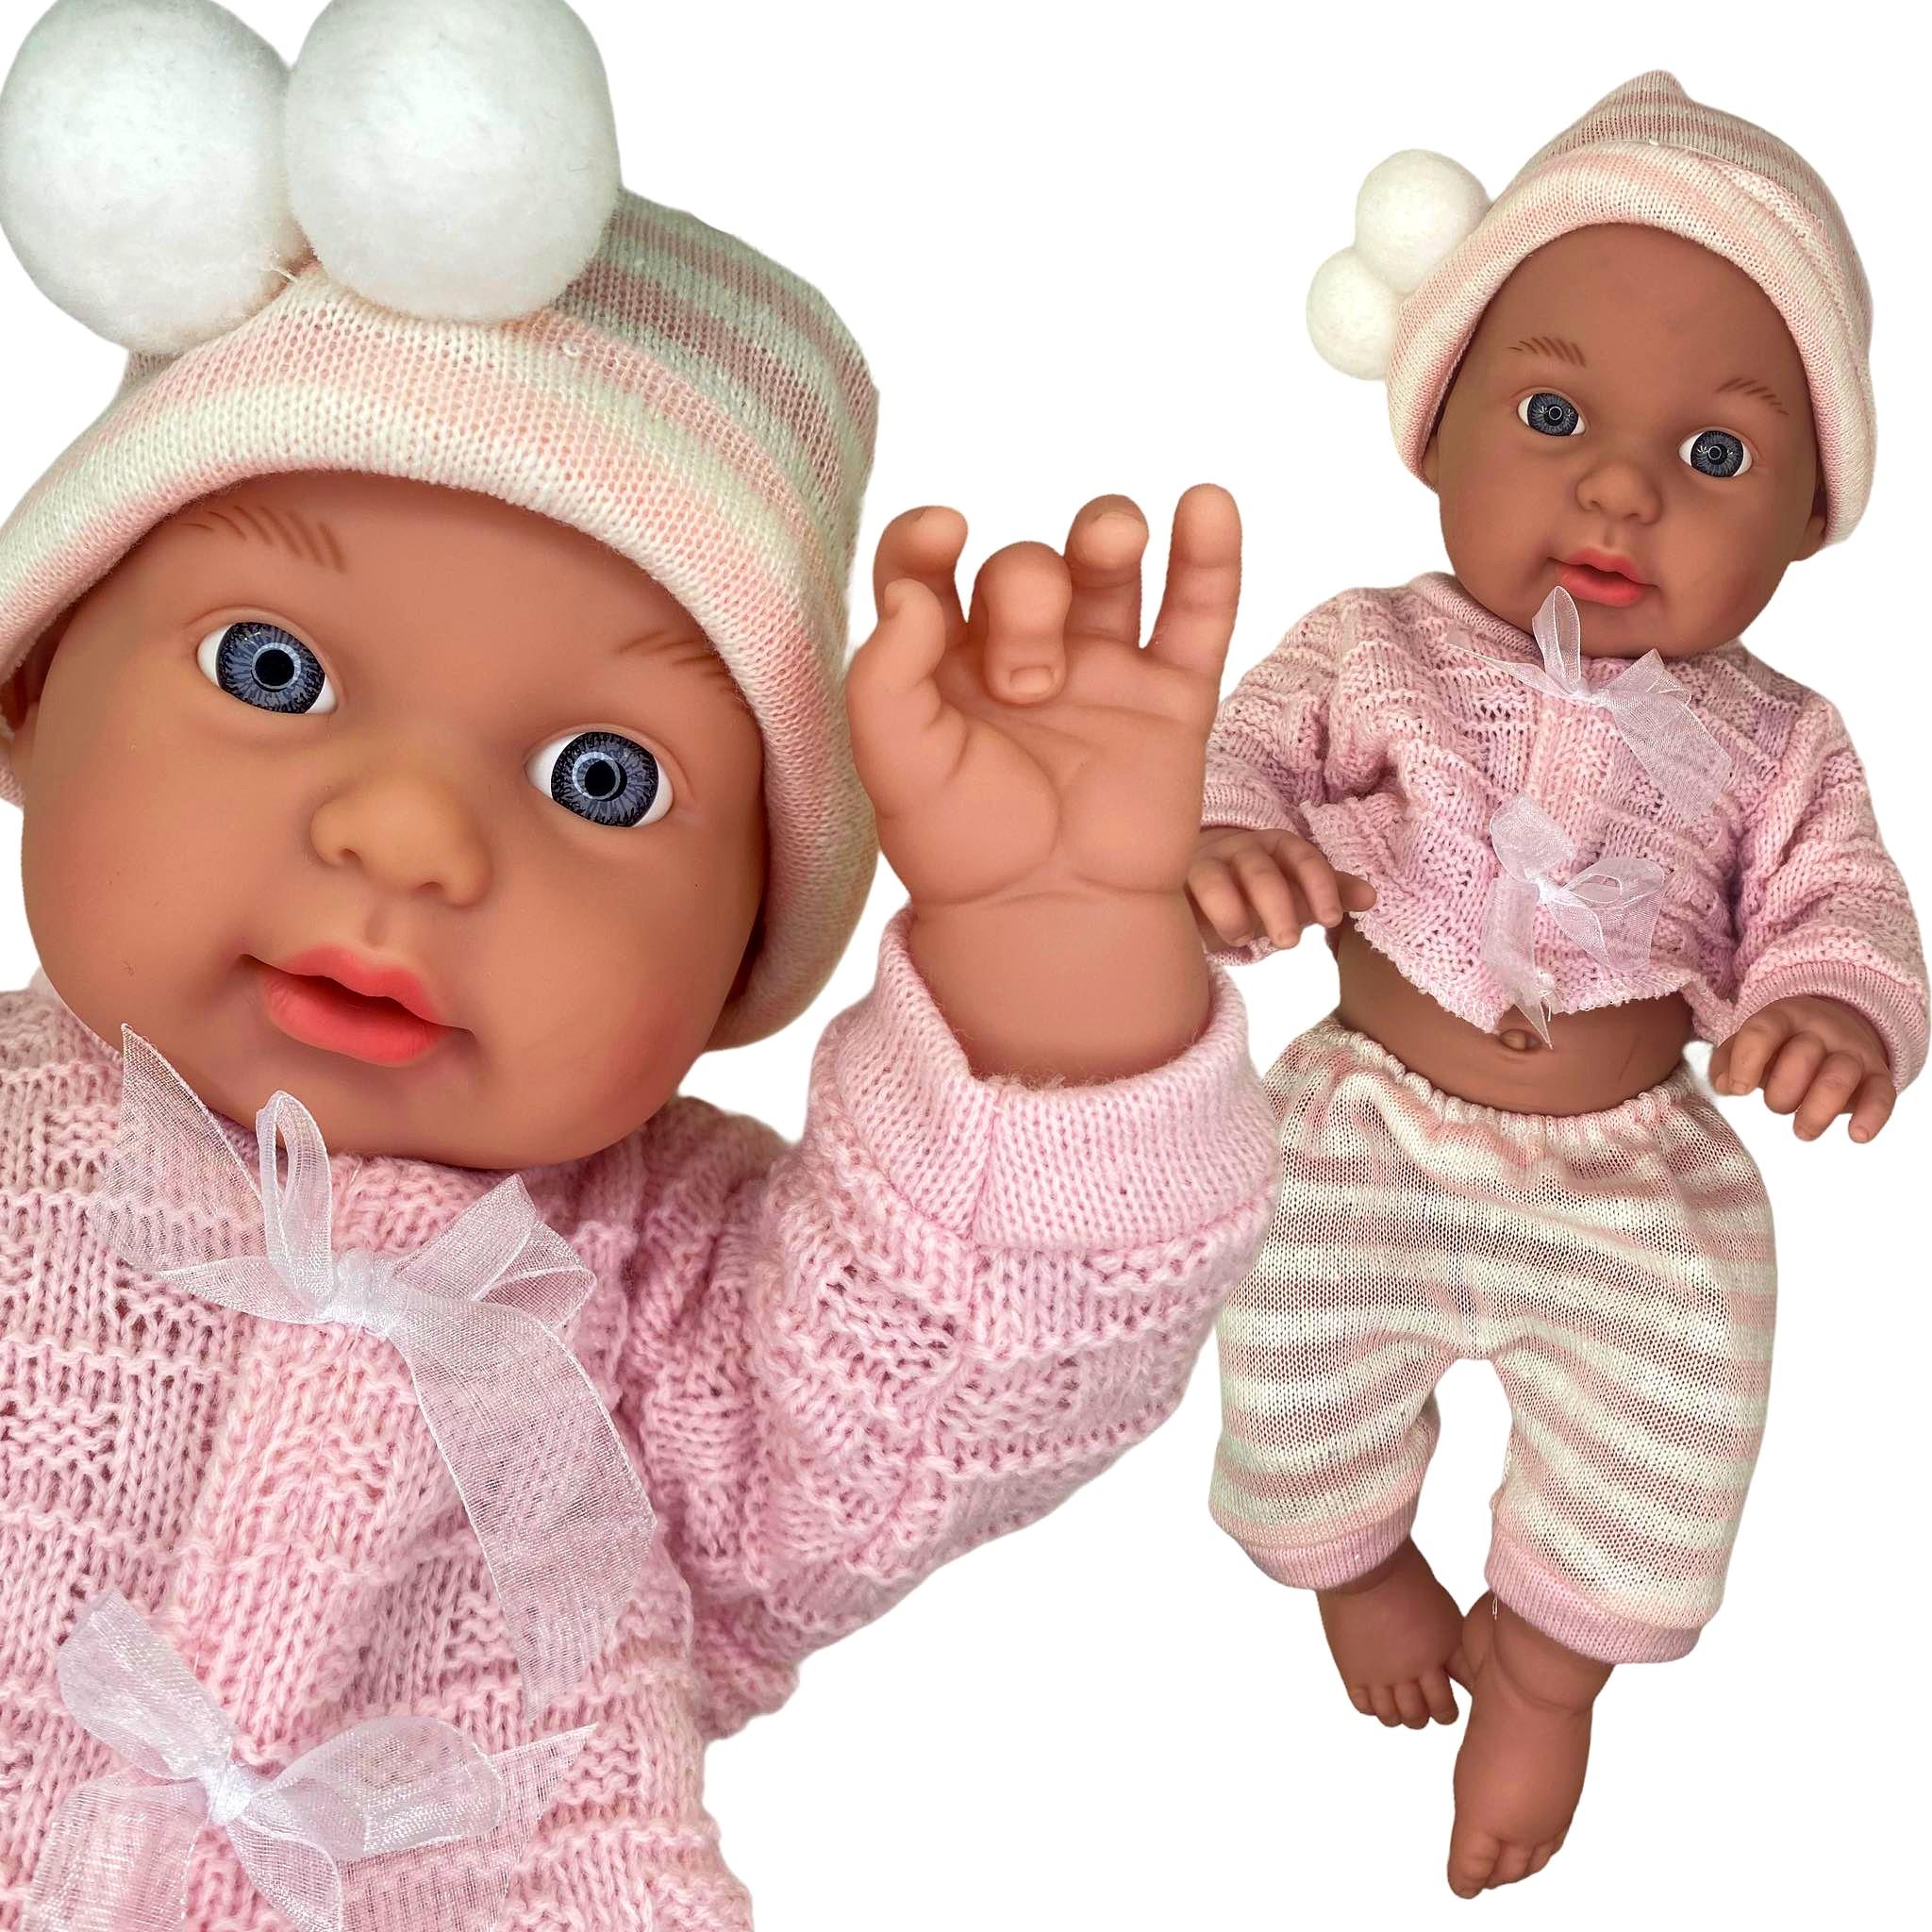 LALKA BOBAS JAK ŻYWA 40 CM NEW BORN BABY